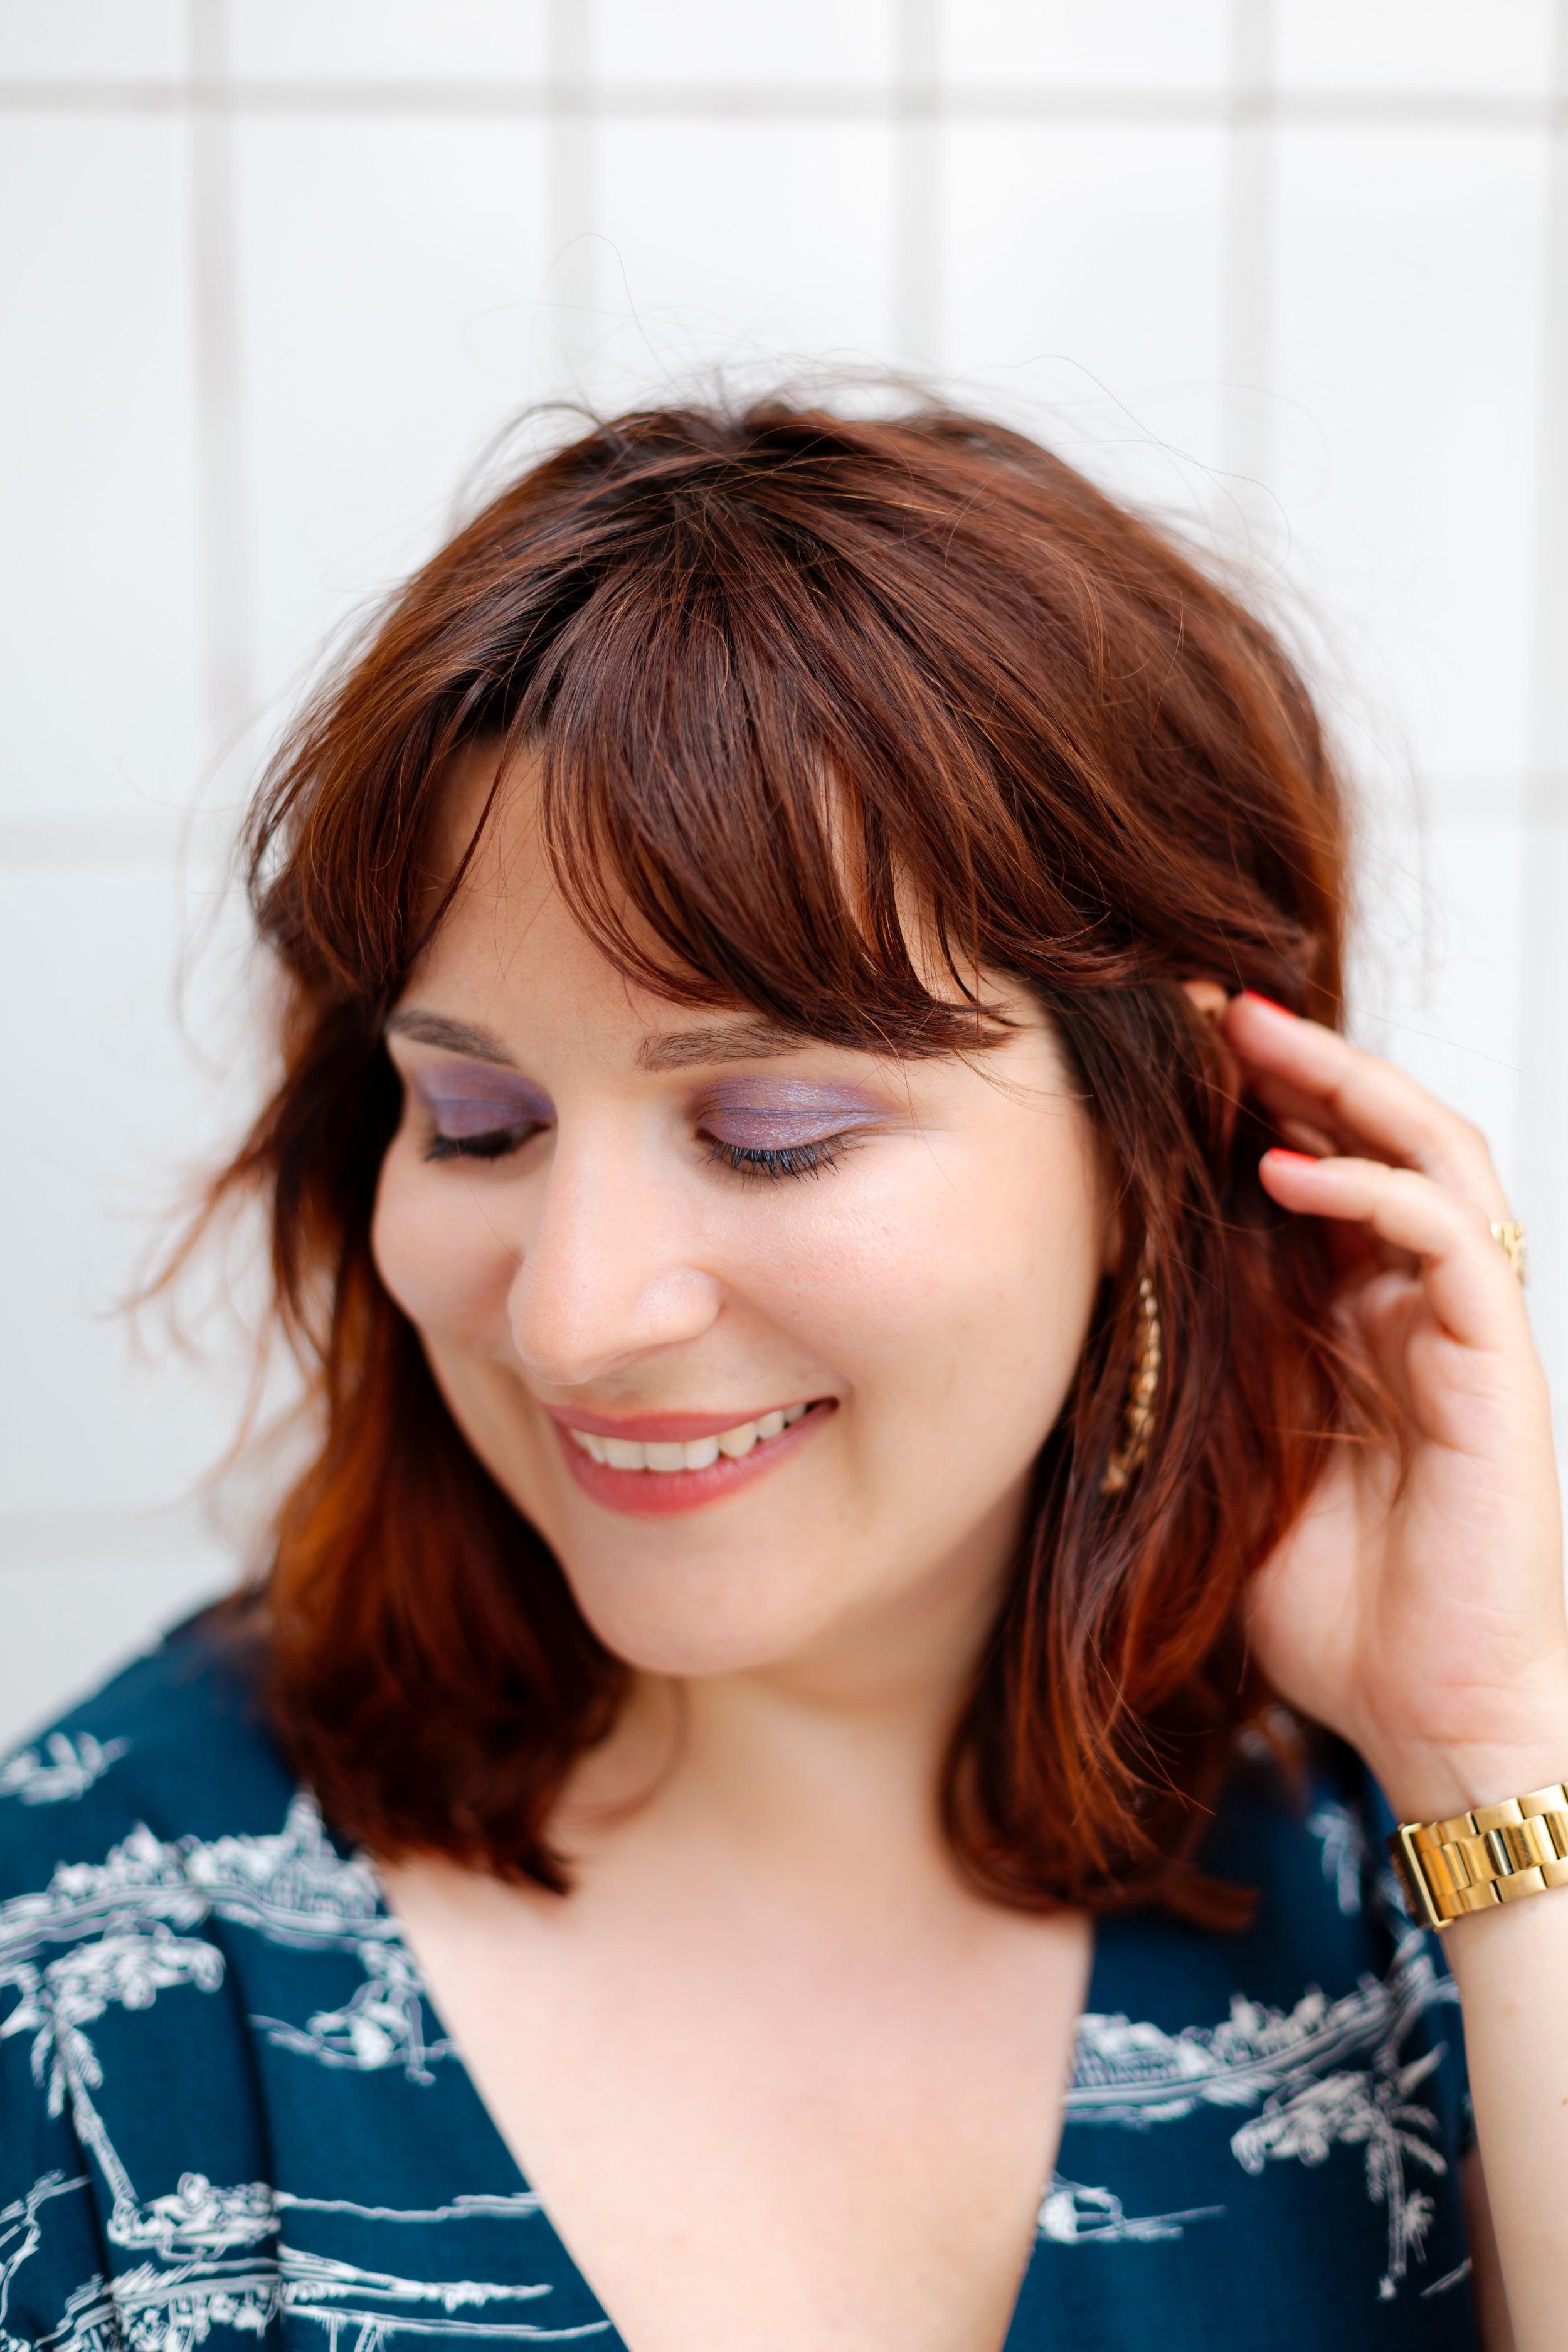 maquillage-des-yeux-violet